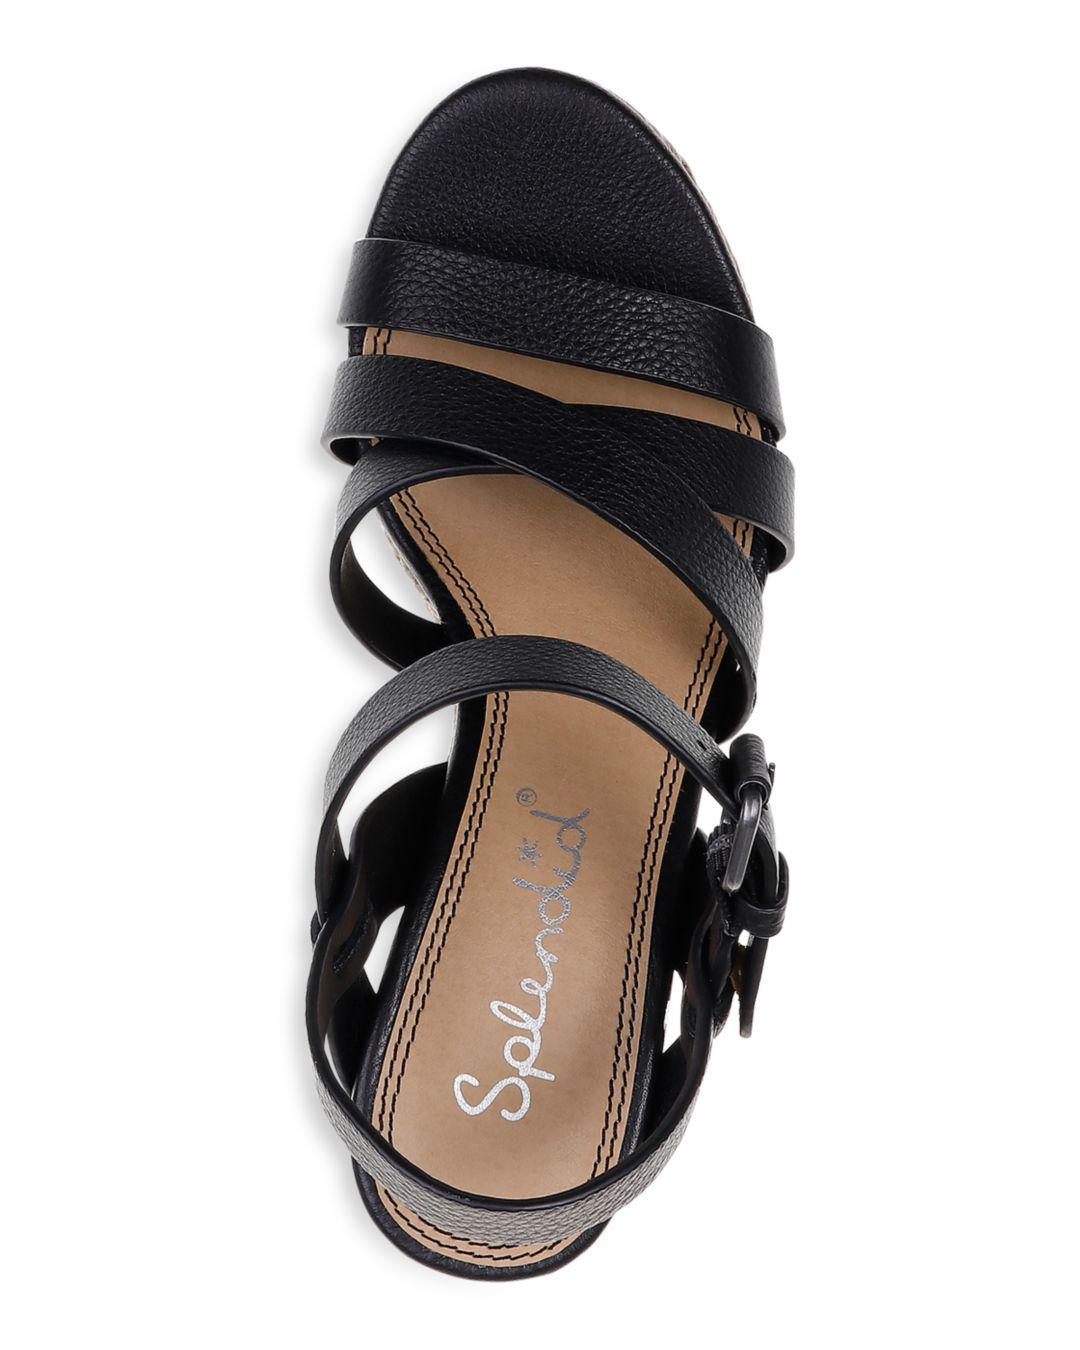 8880261005f Lyst - Splendid Women's Billie Leather Platform Wedge Espadrille ...